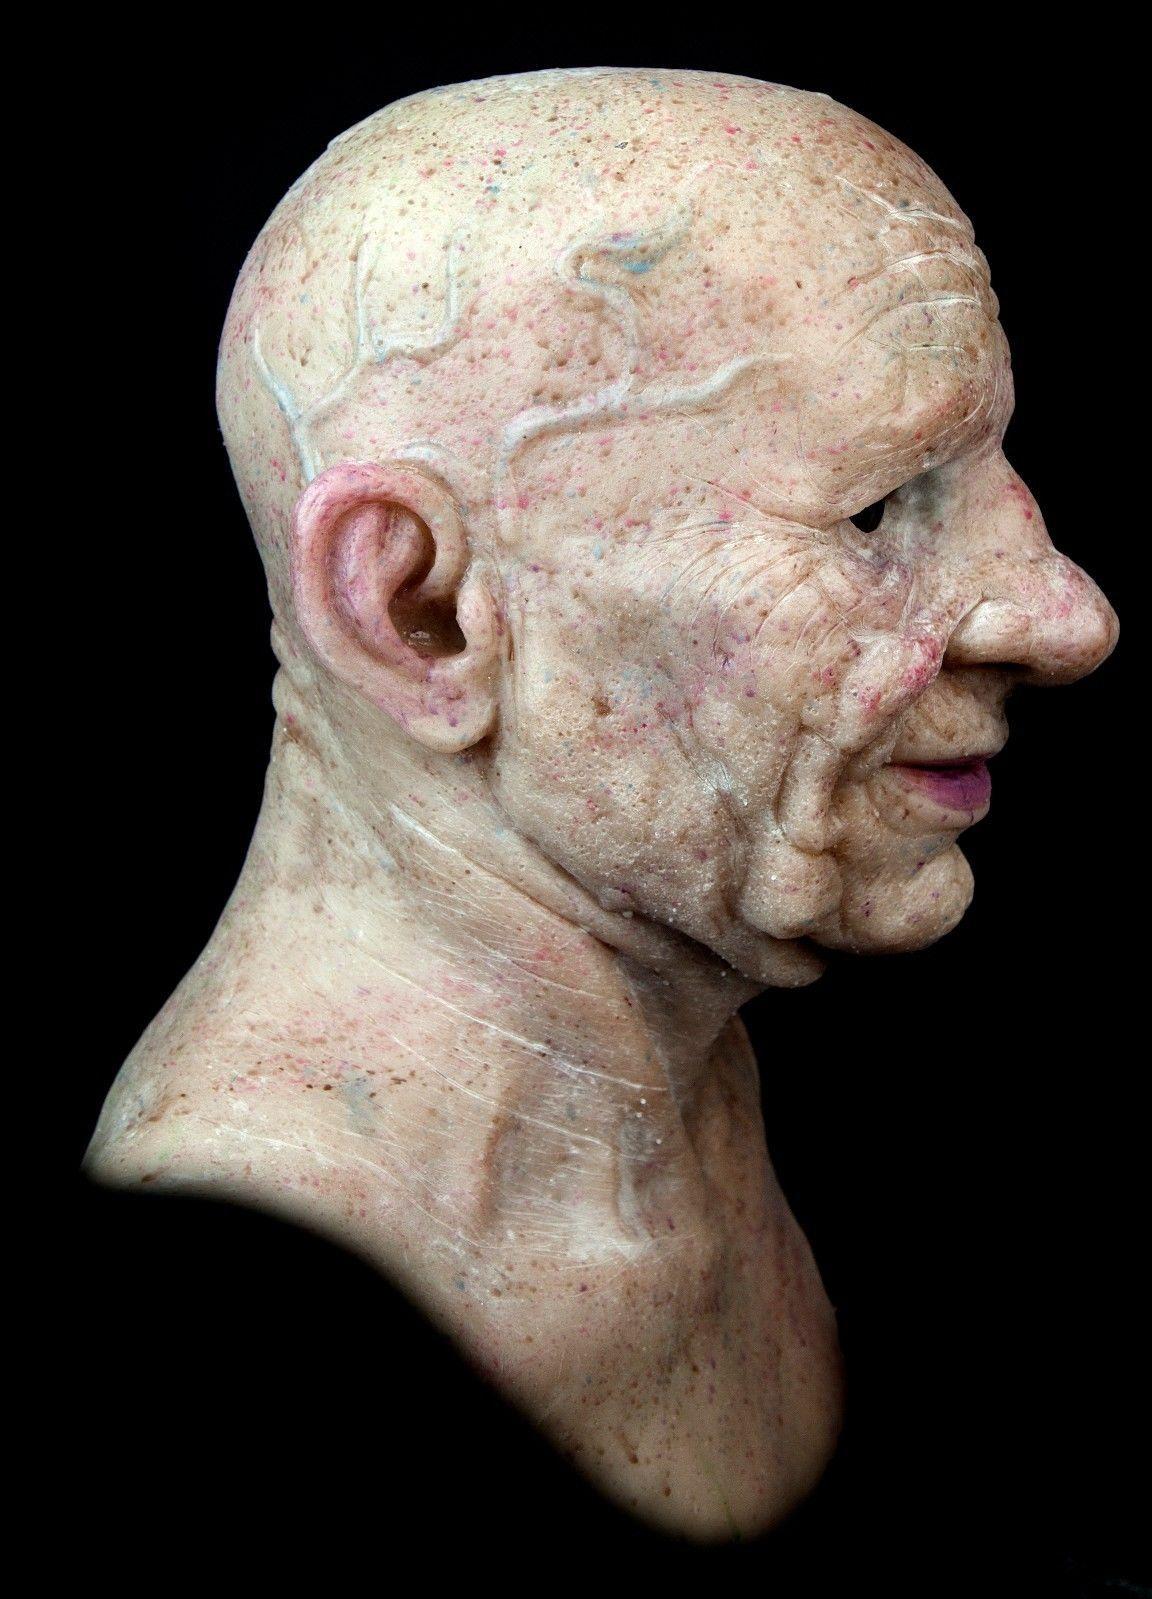 warts on old skin wart treatment ayurvedic medicine